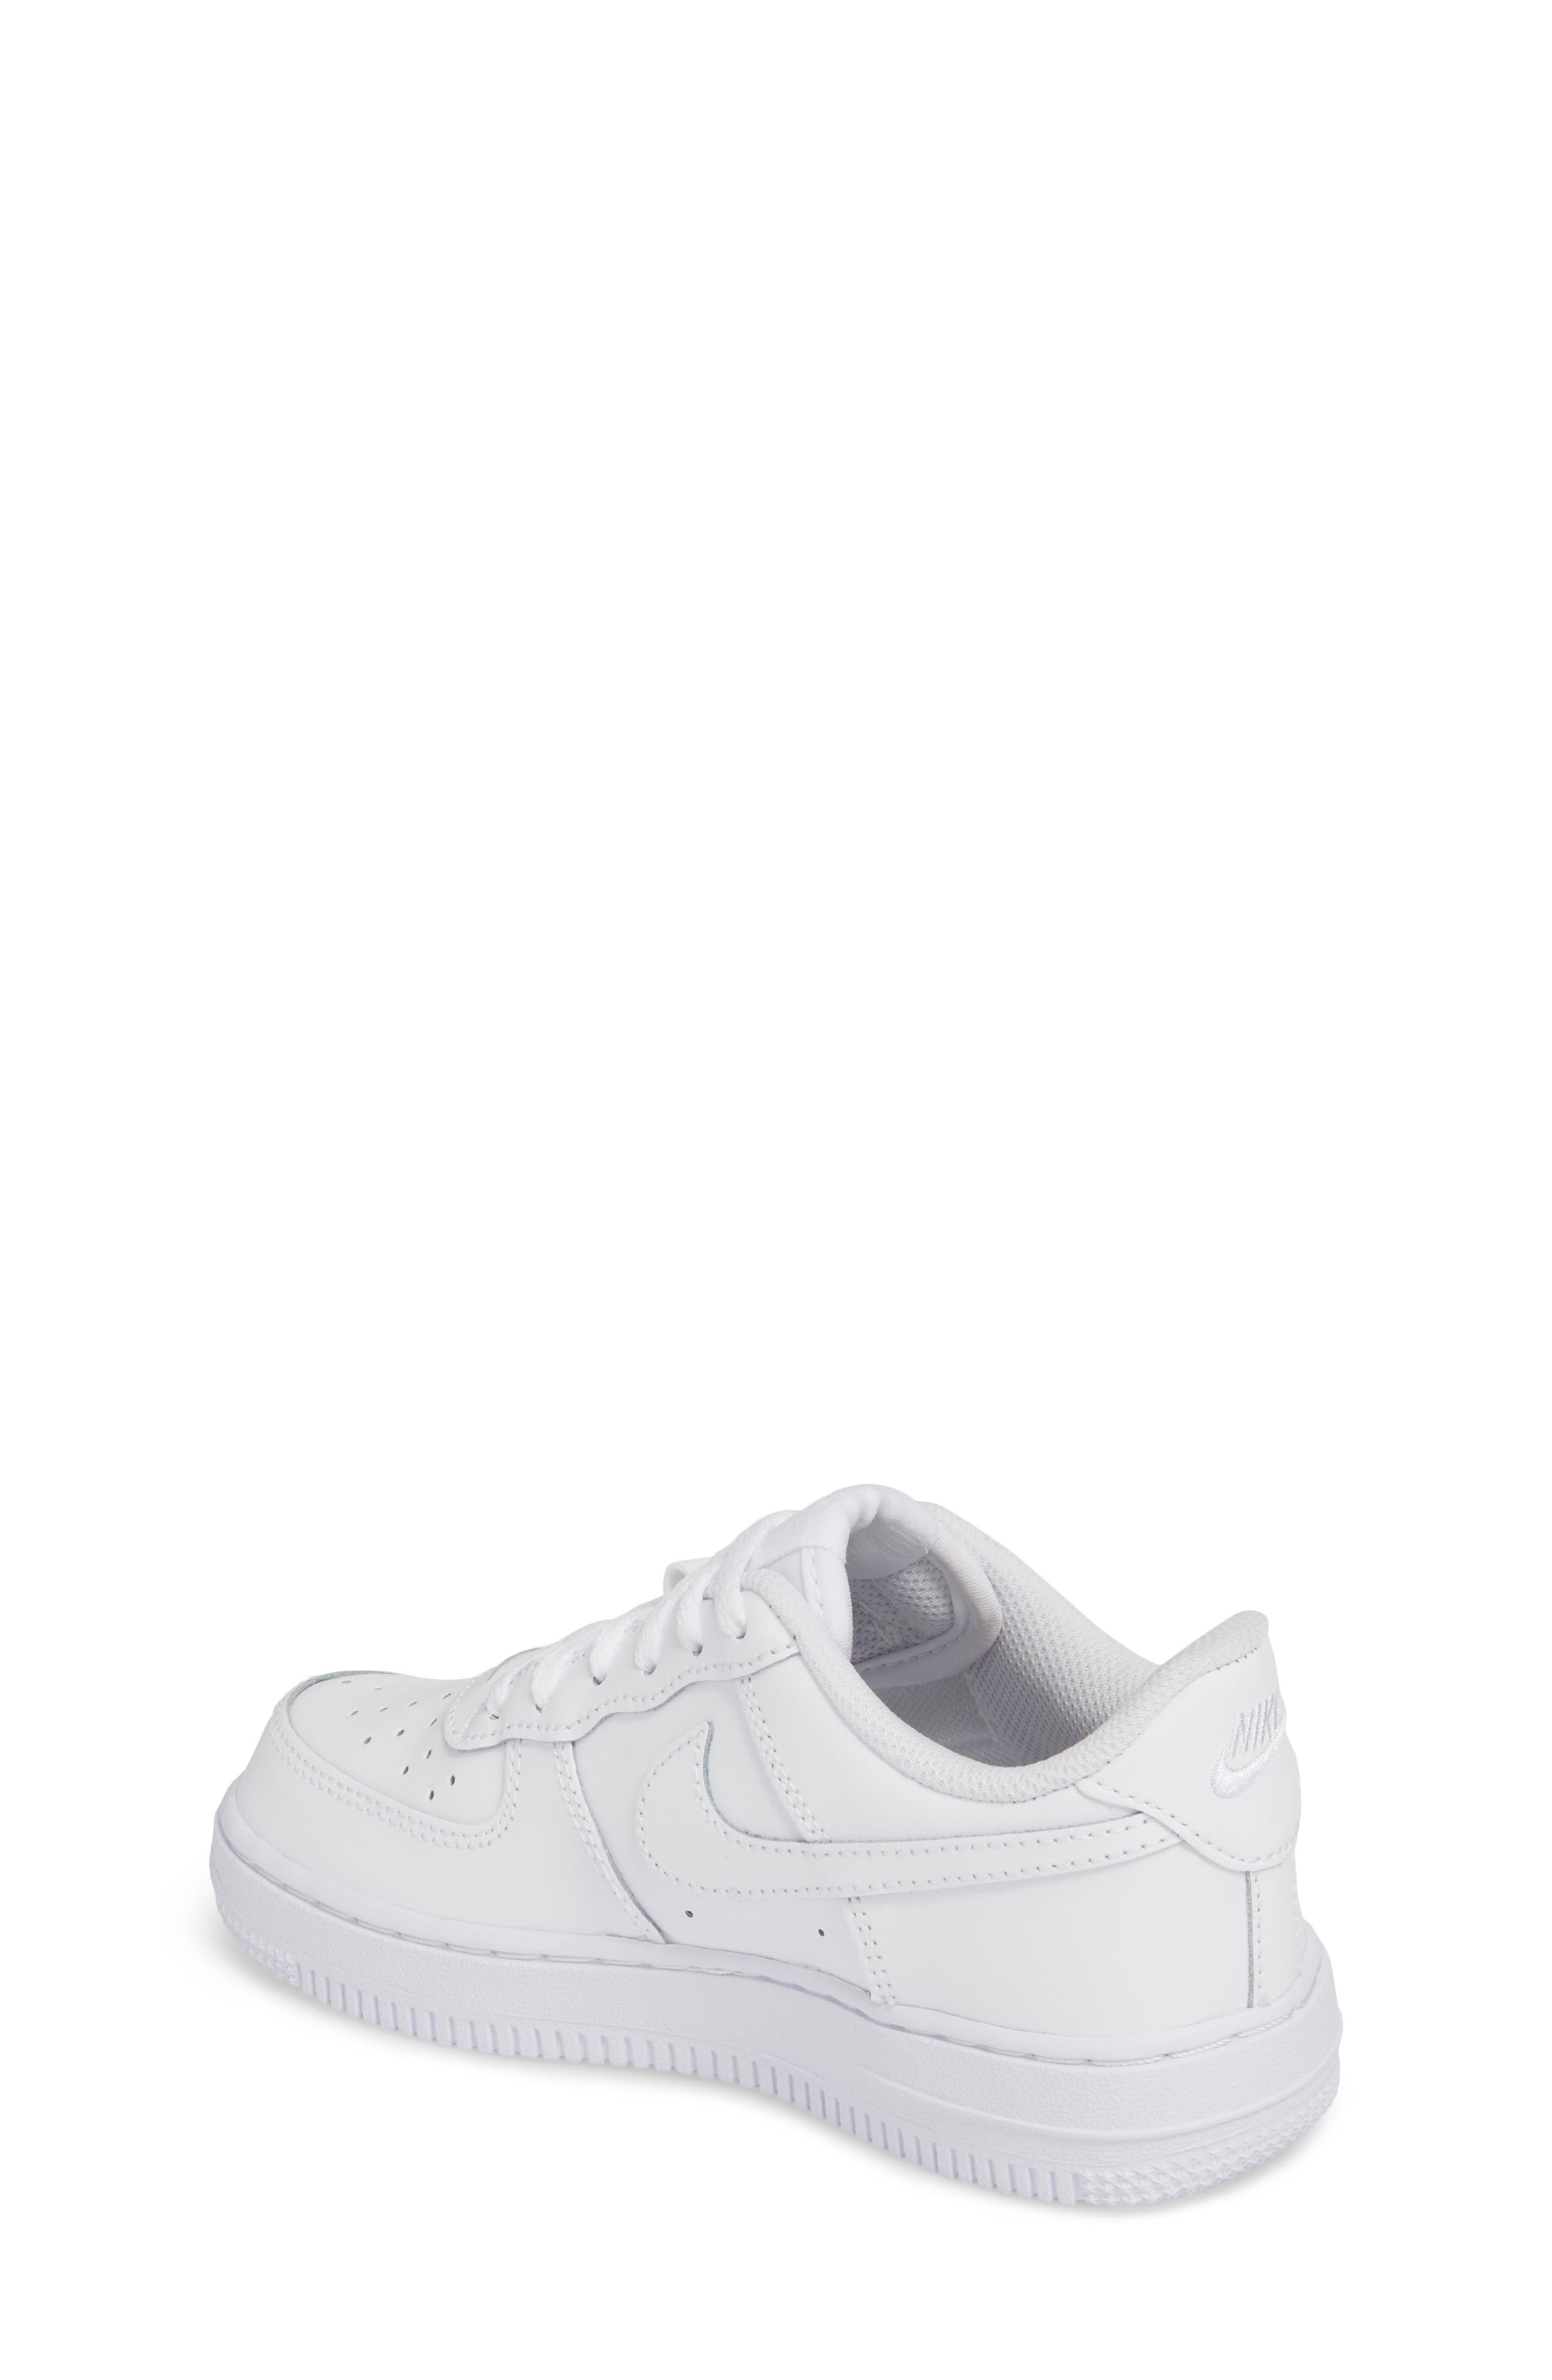 950121b34d53c Kids' Nike | Nordstrom